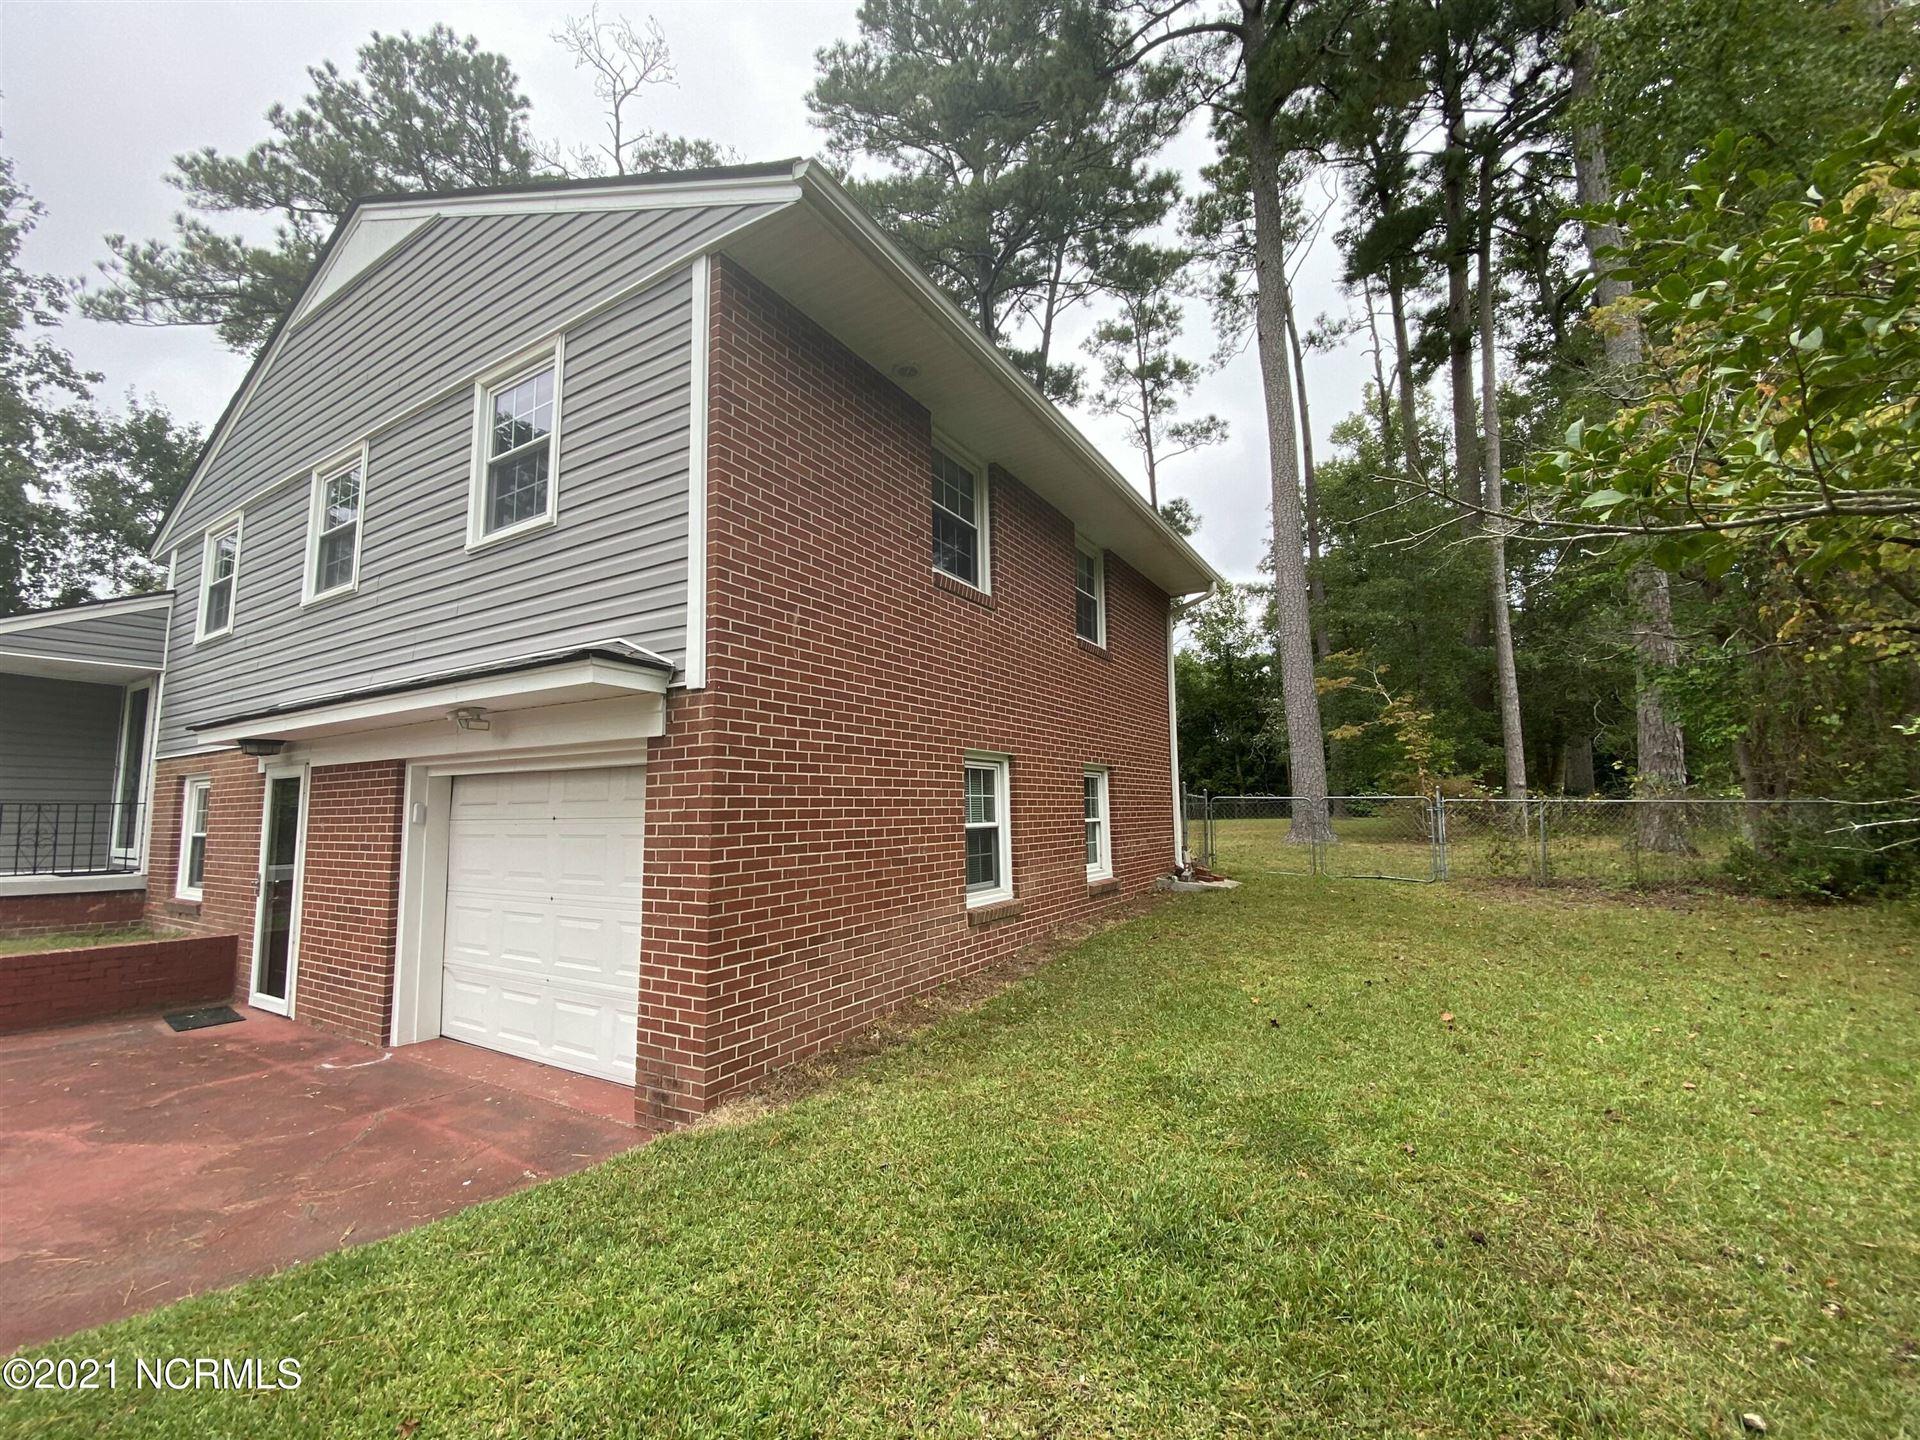 Photo of 132 E Sherwood Drive, Havelock, NC 28532 (MLS # 100294916)